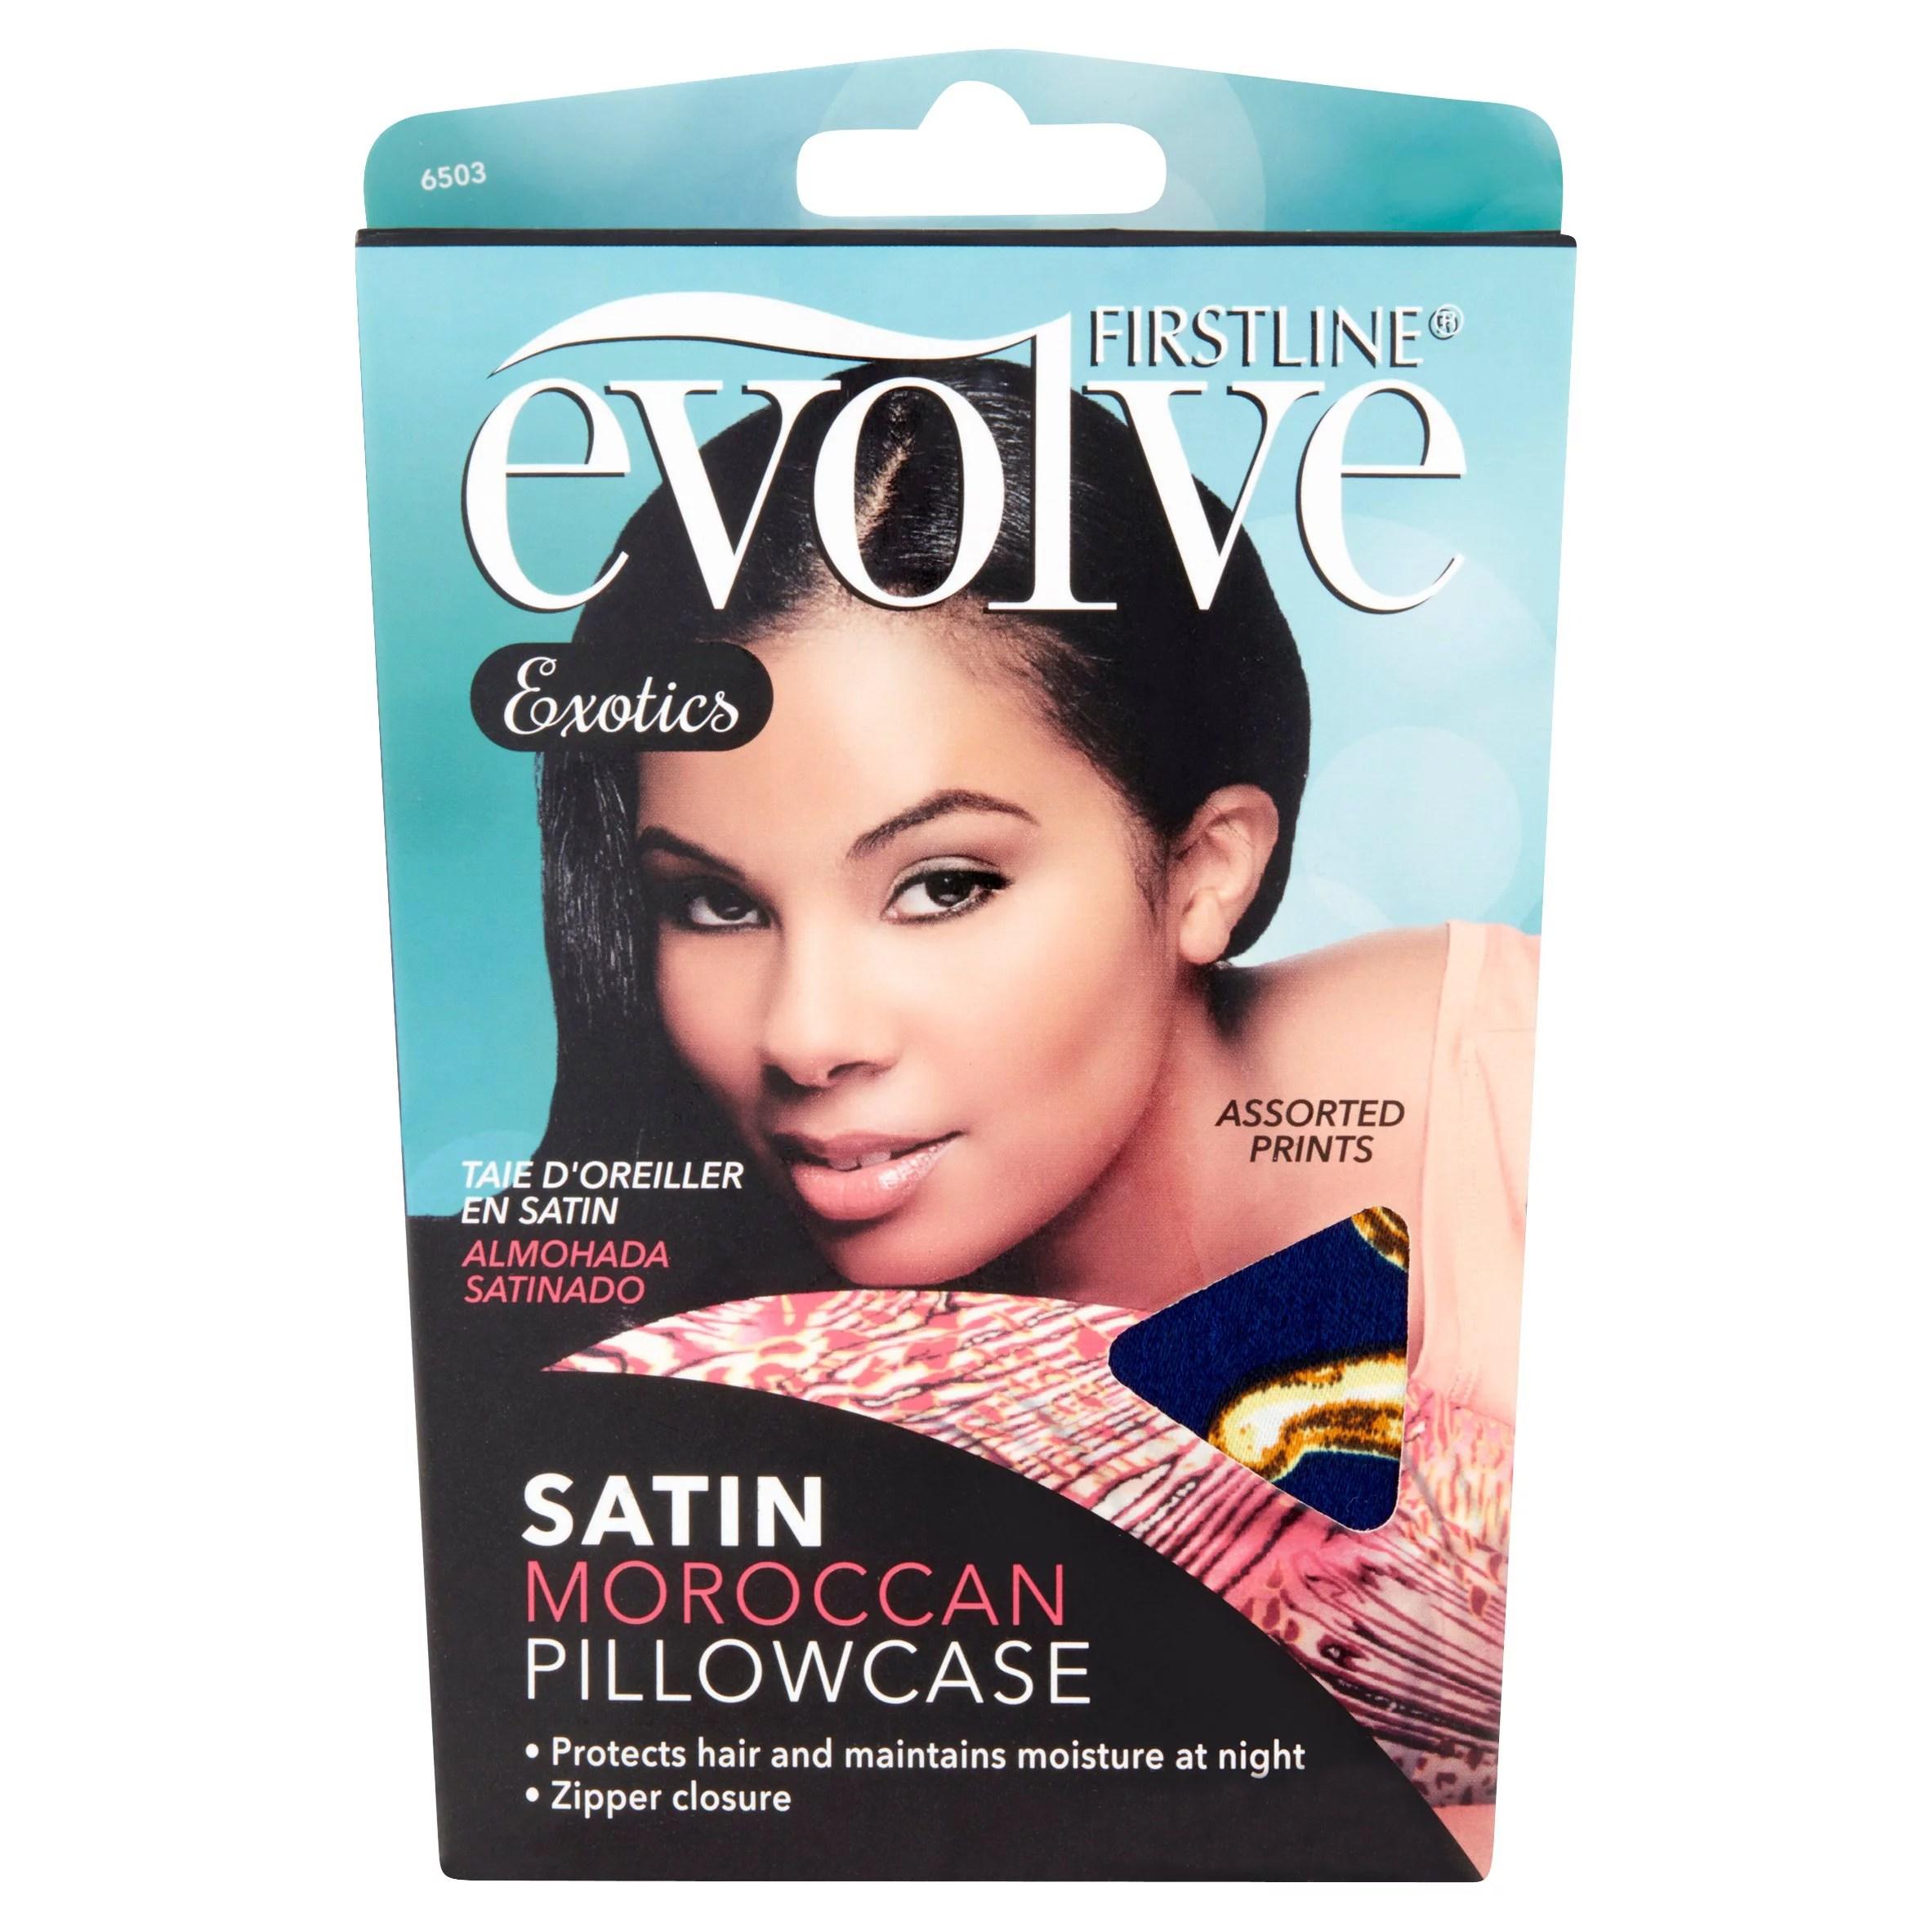 firstline evolve exotics satin moroccan pillowcase